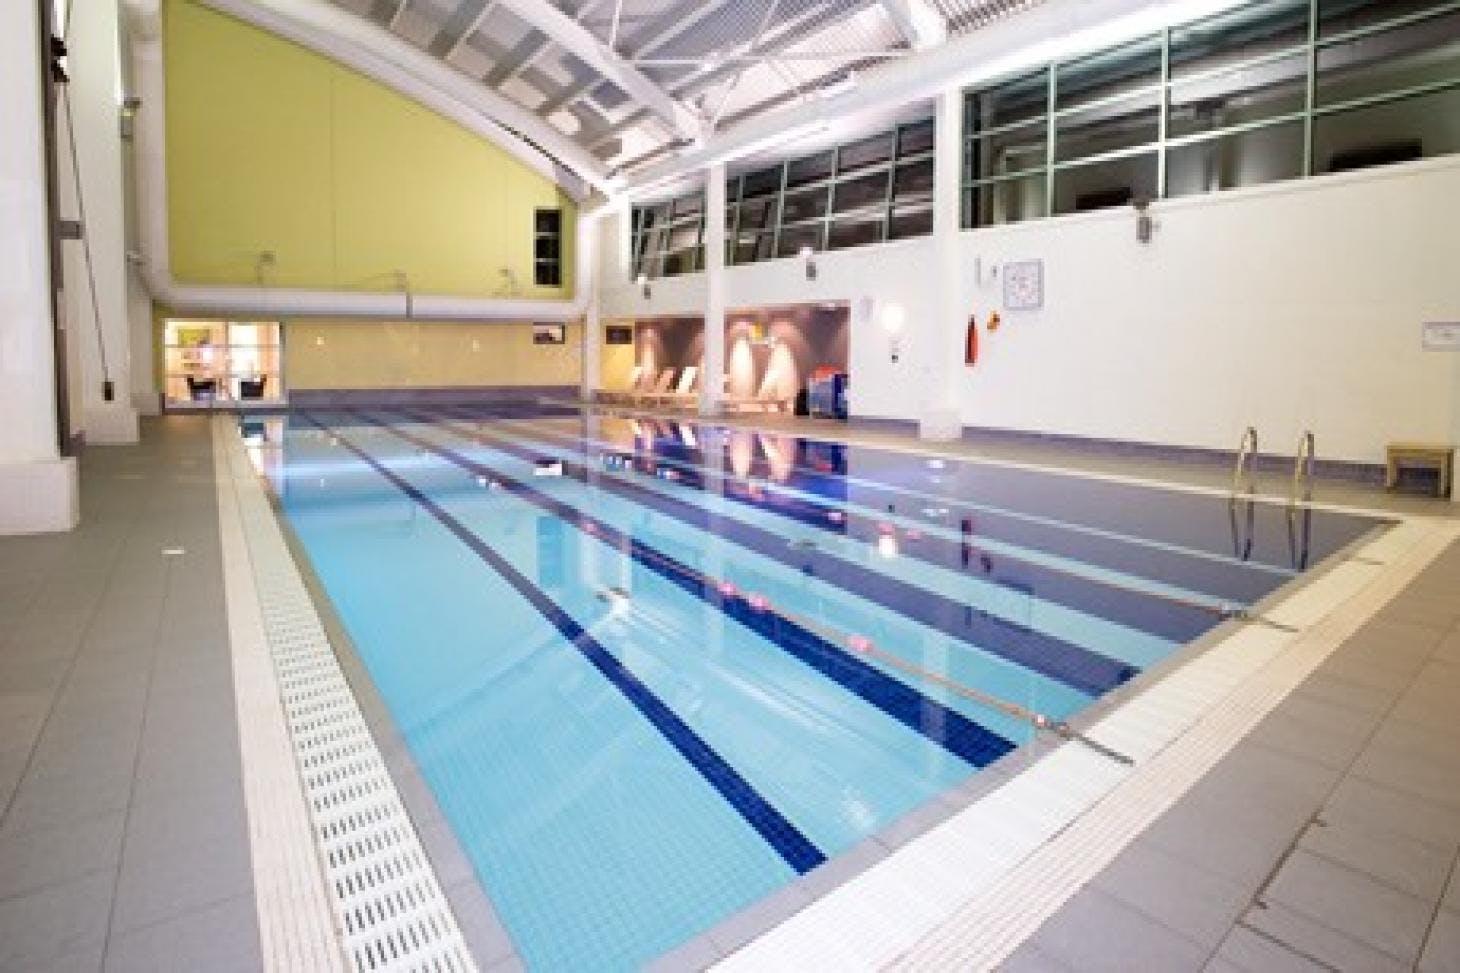 Nuffield Health Wandsworth Indoor swimming pool